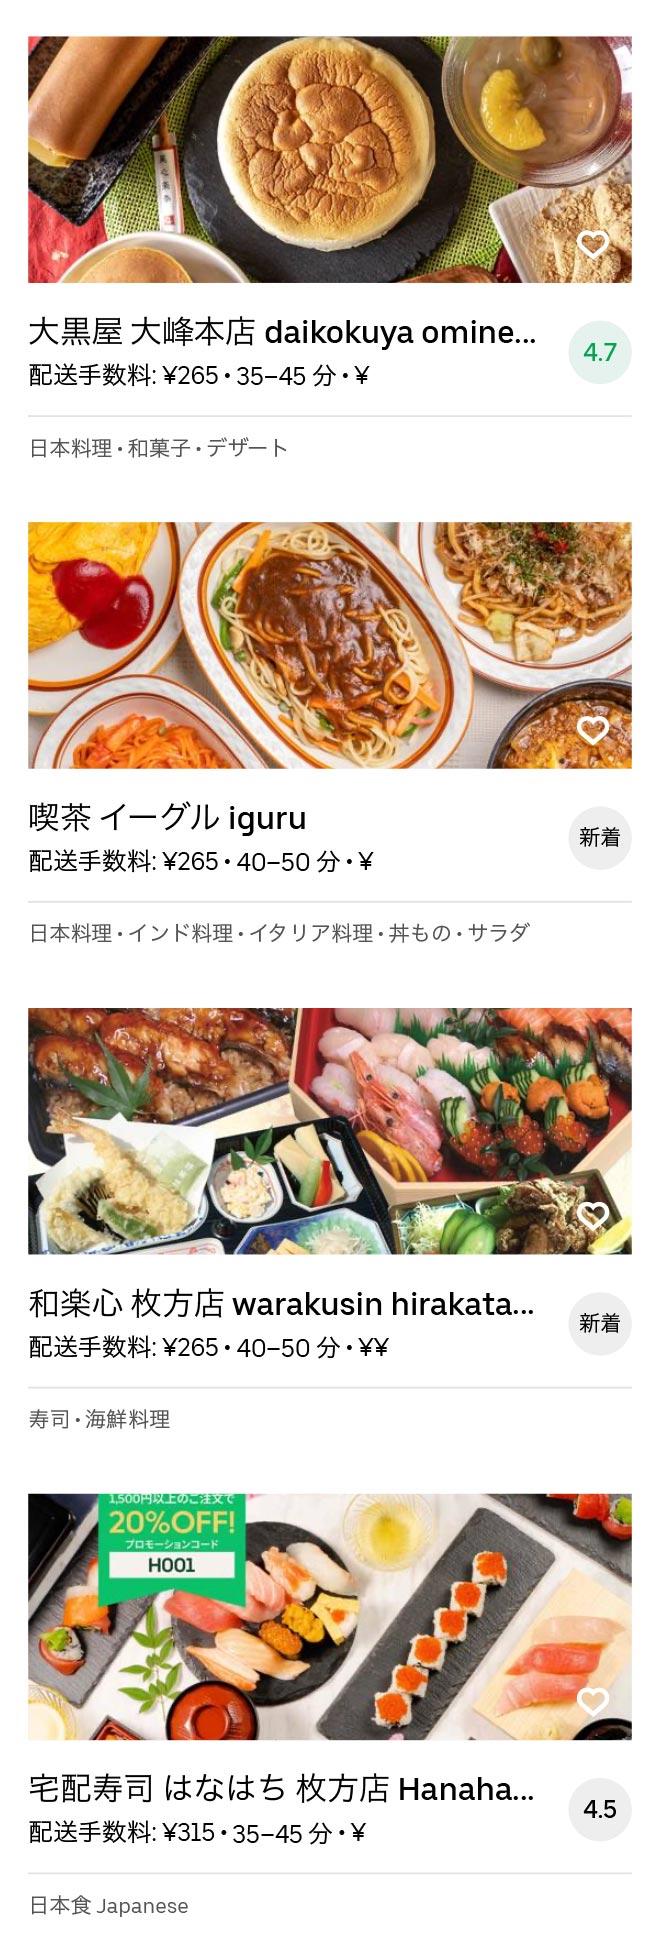 Nagao menu 2010 08